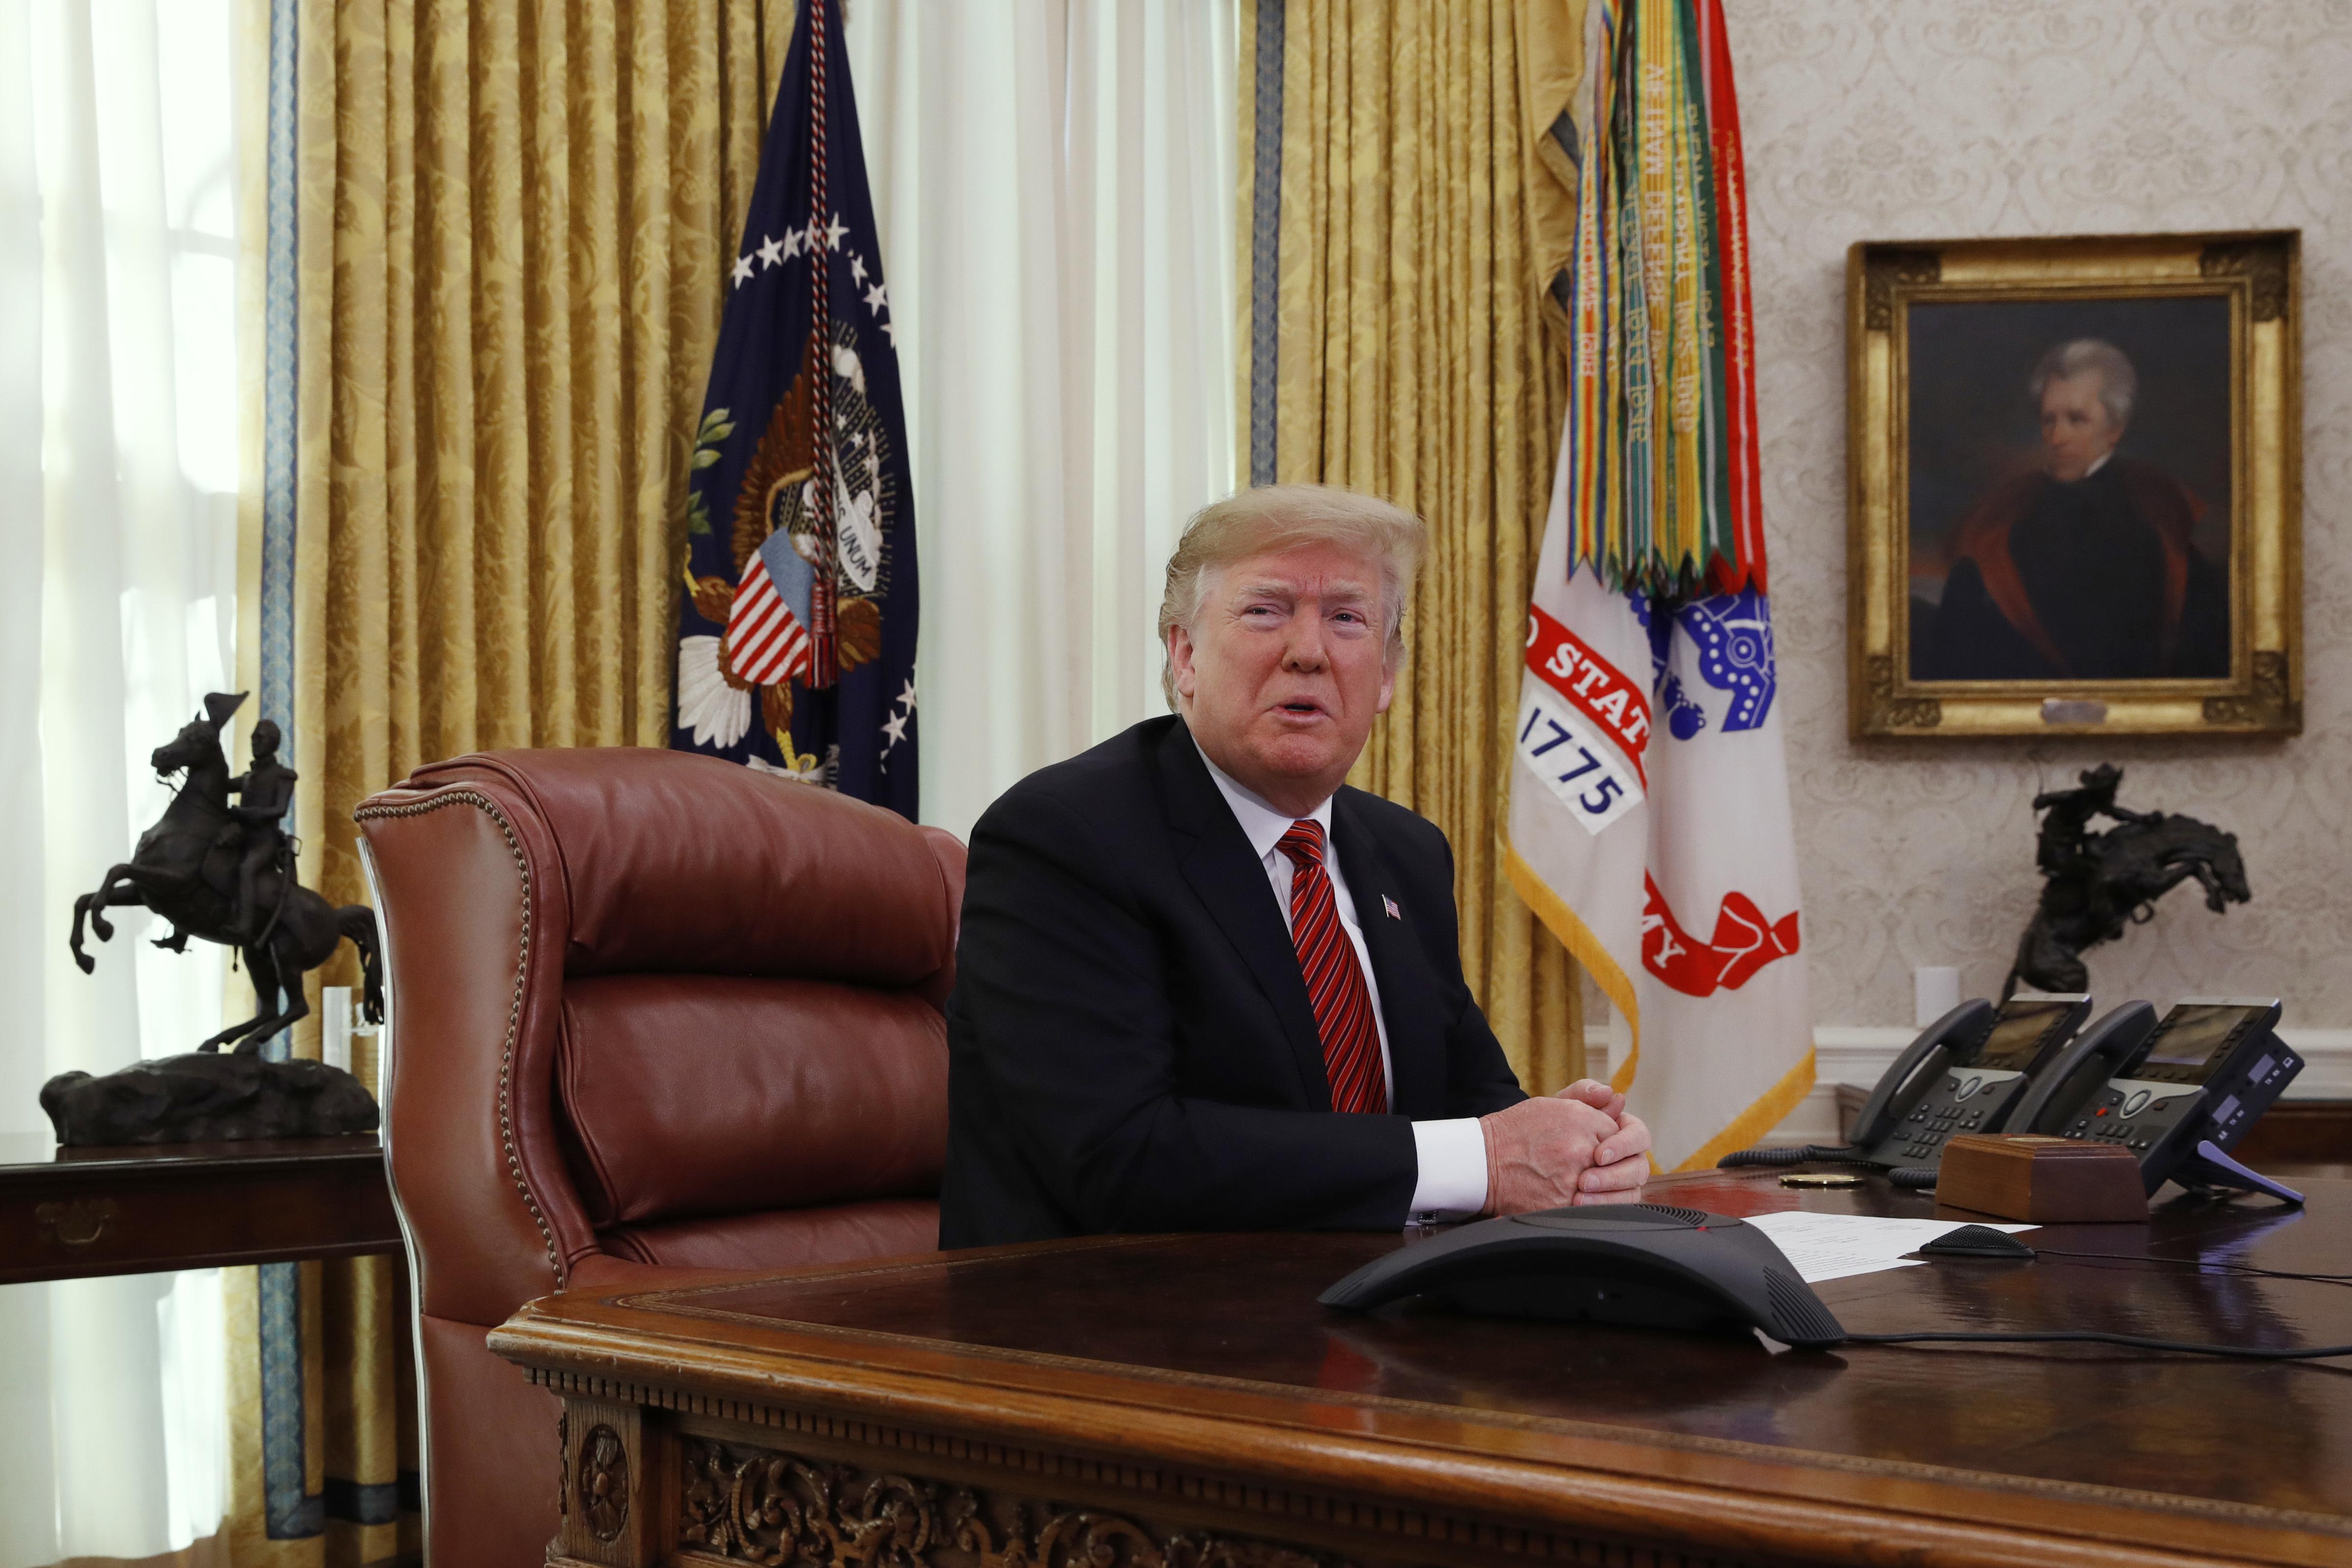 Trump 2021 Christmas Message Donald Trump Wishes Fake News Media A Merry Christmas Deadline